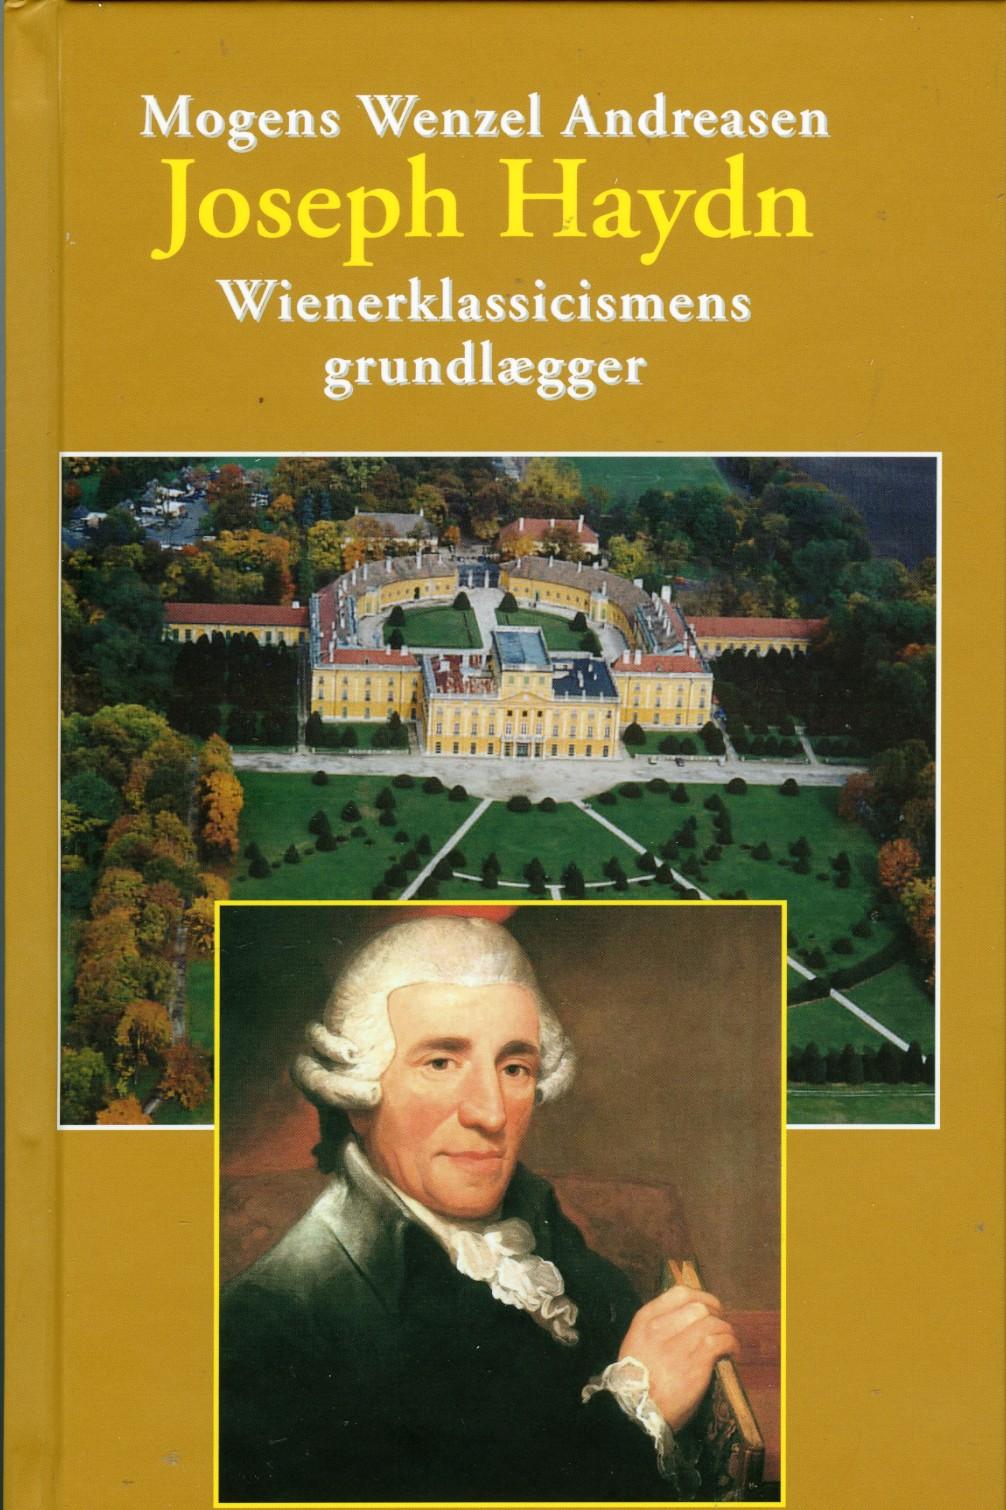 Joseph Haydn - Mogens Wenzel Andreasen - Bøger - Olufsen - 9788793331525 - April 4, 2018